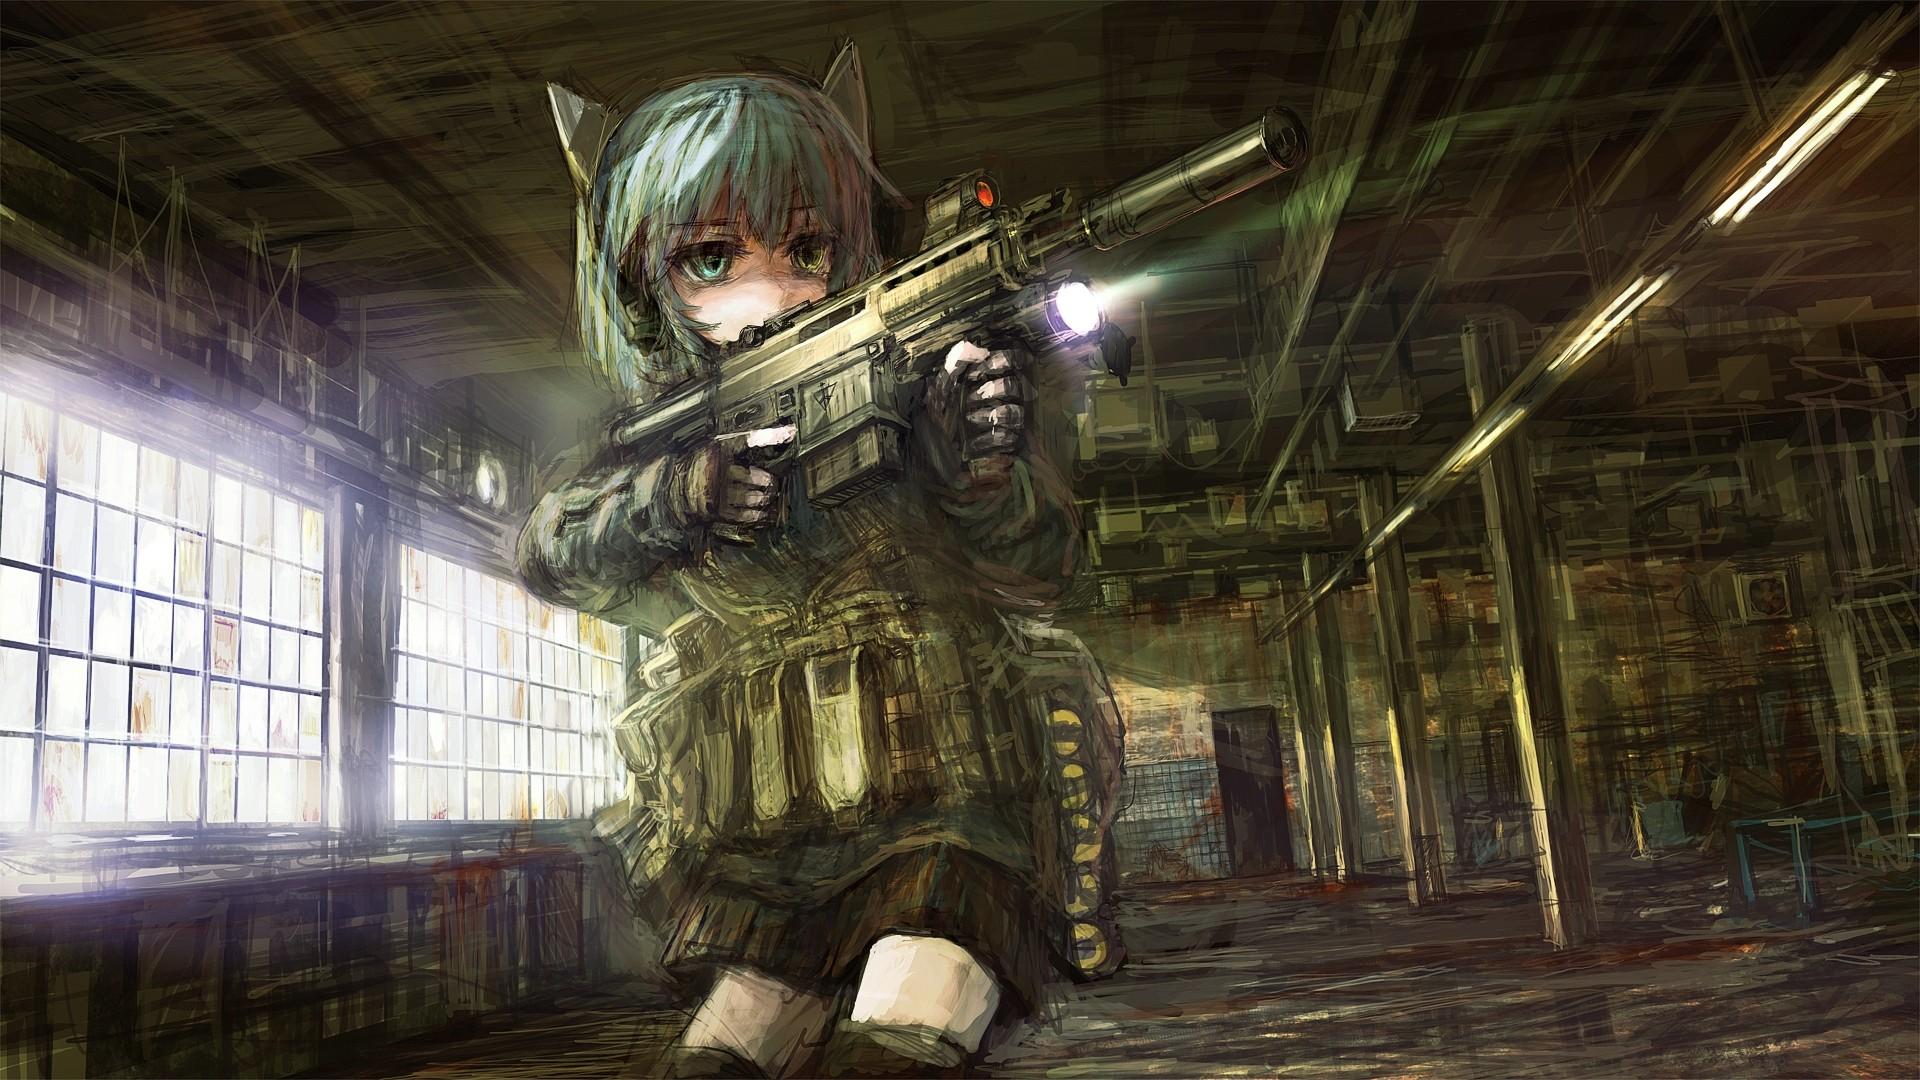 Anime Girls With Guns Wallpaper Free Download